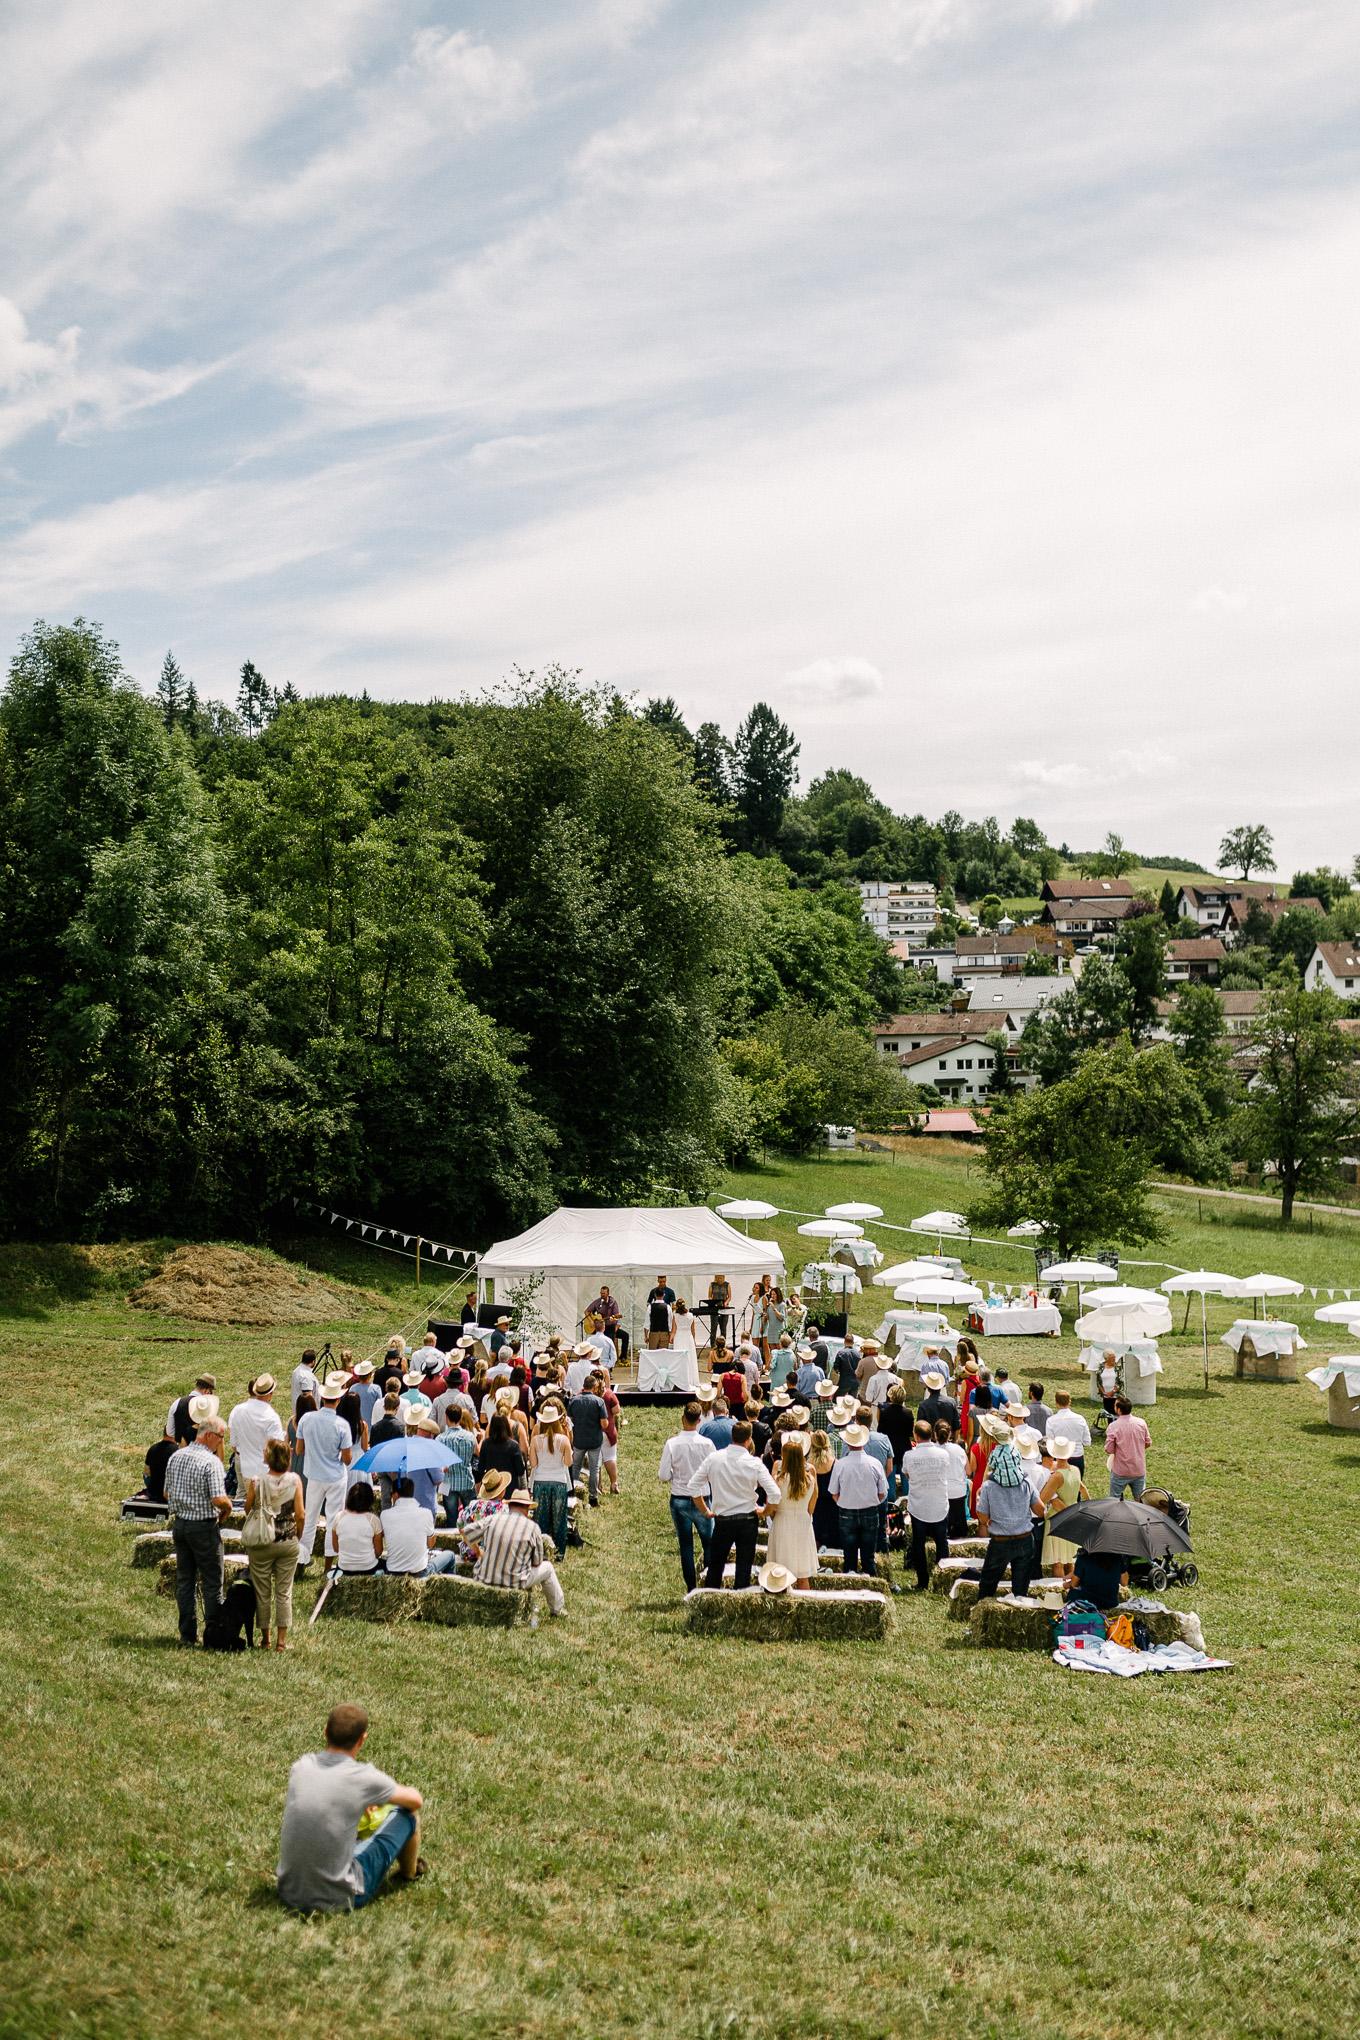 Boho-Scheune-Bauern-Hochzeit-Lörrach-Rheinfelden-Pia-Anna-Christian-Photography-NC-30.jpg